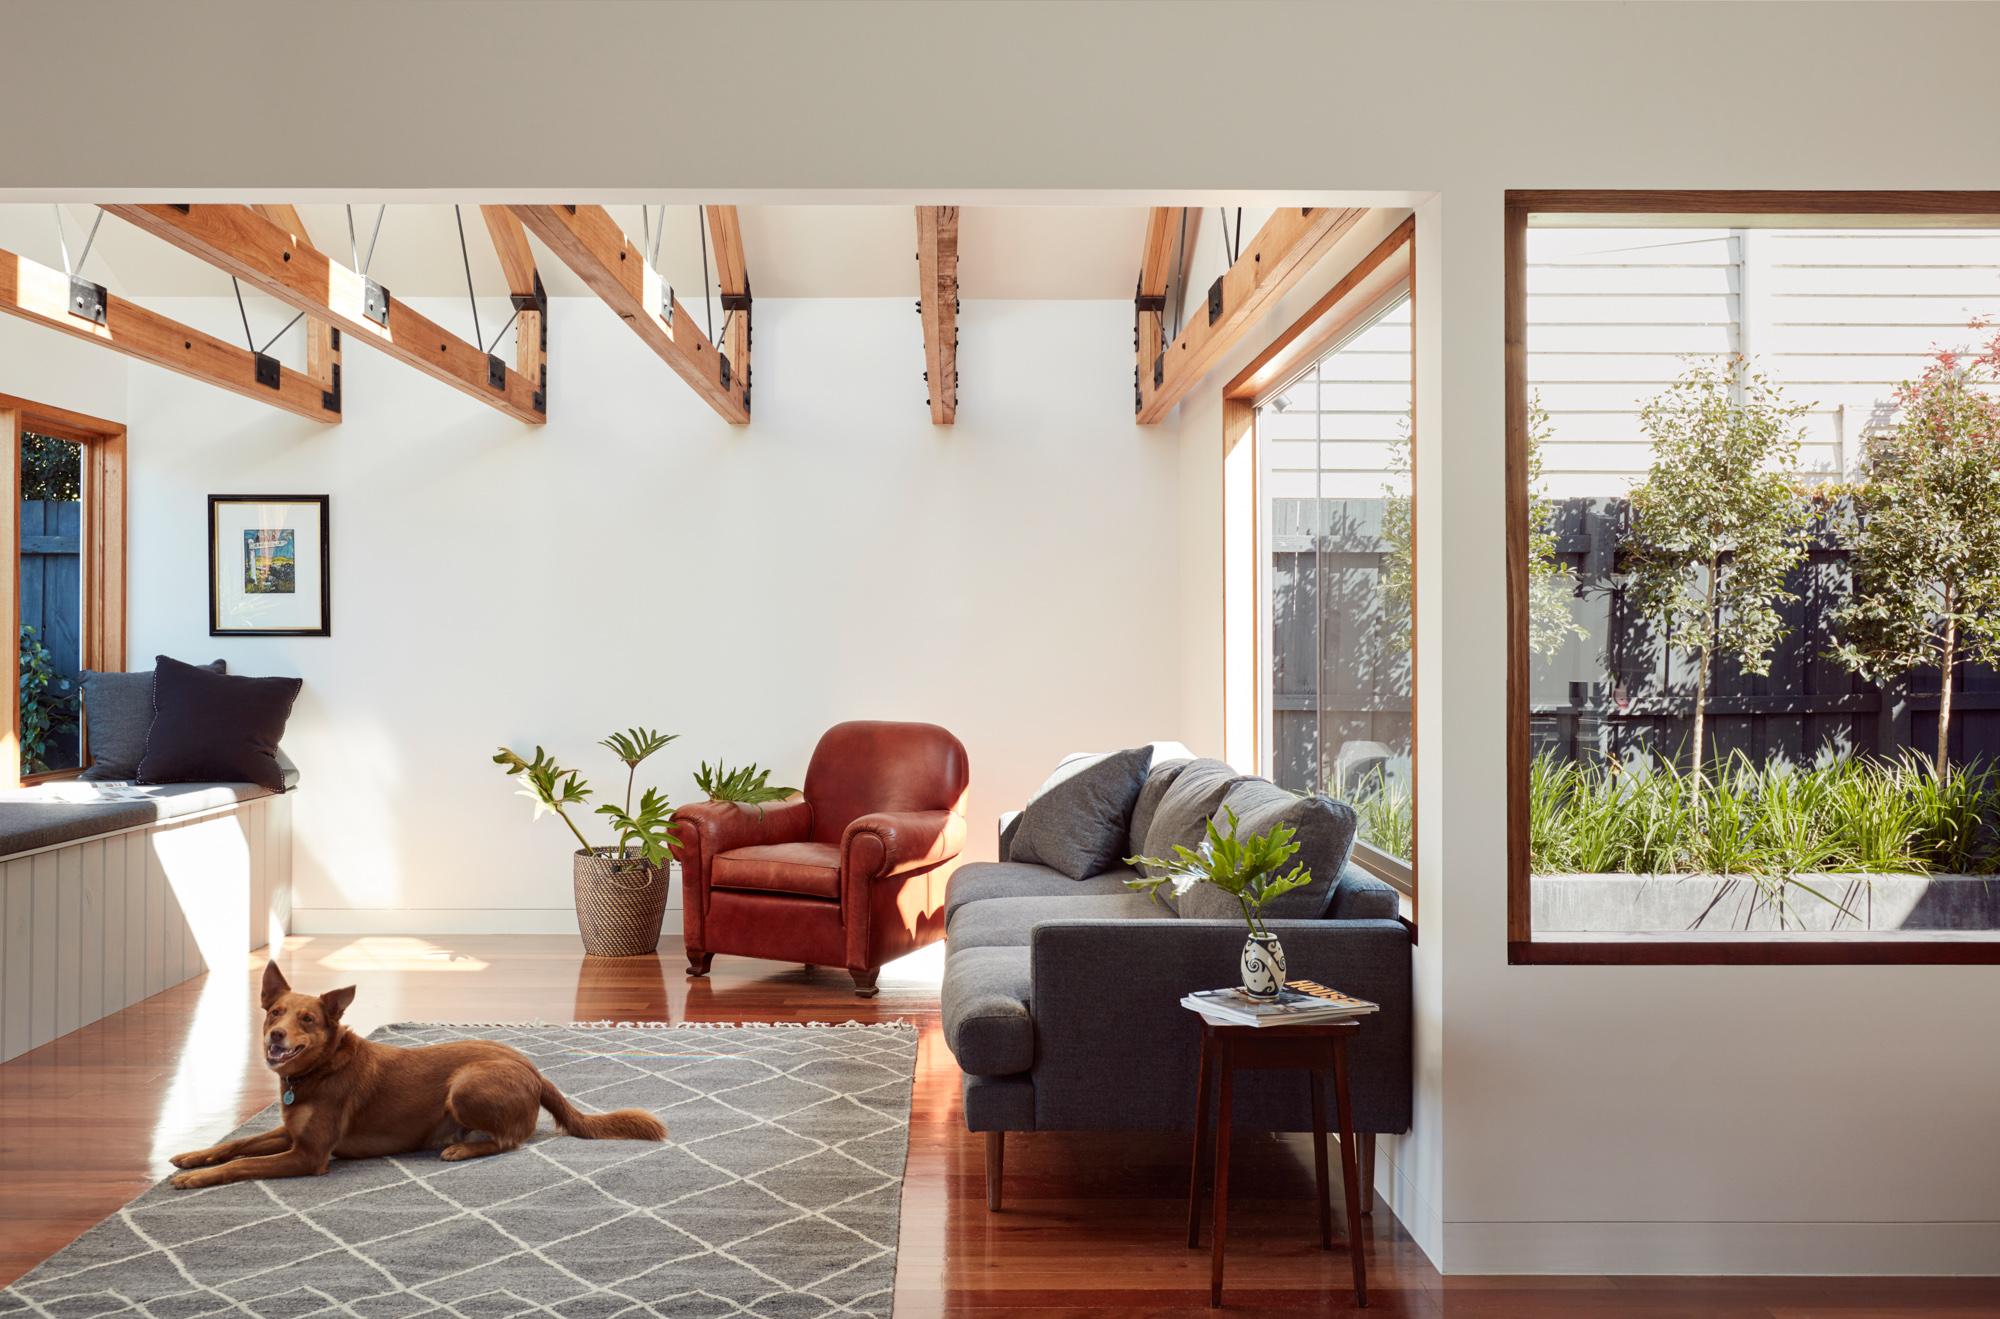 Gallery Of Albert Park House Local Australian Contemporary Interior Design & Residential Styling Albert Park, Melbourne Image 16